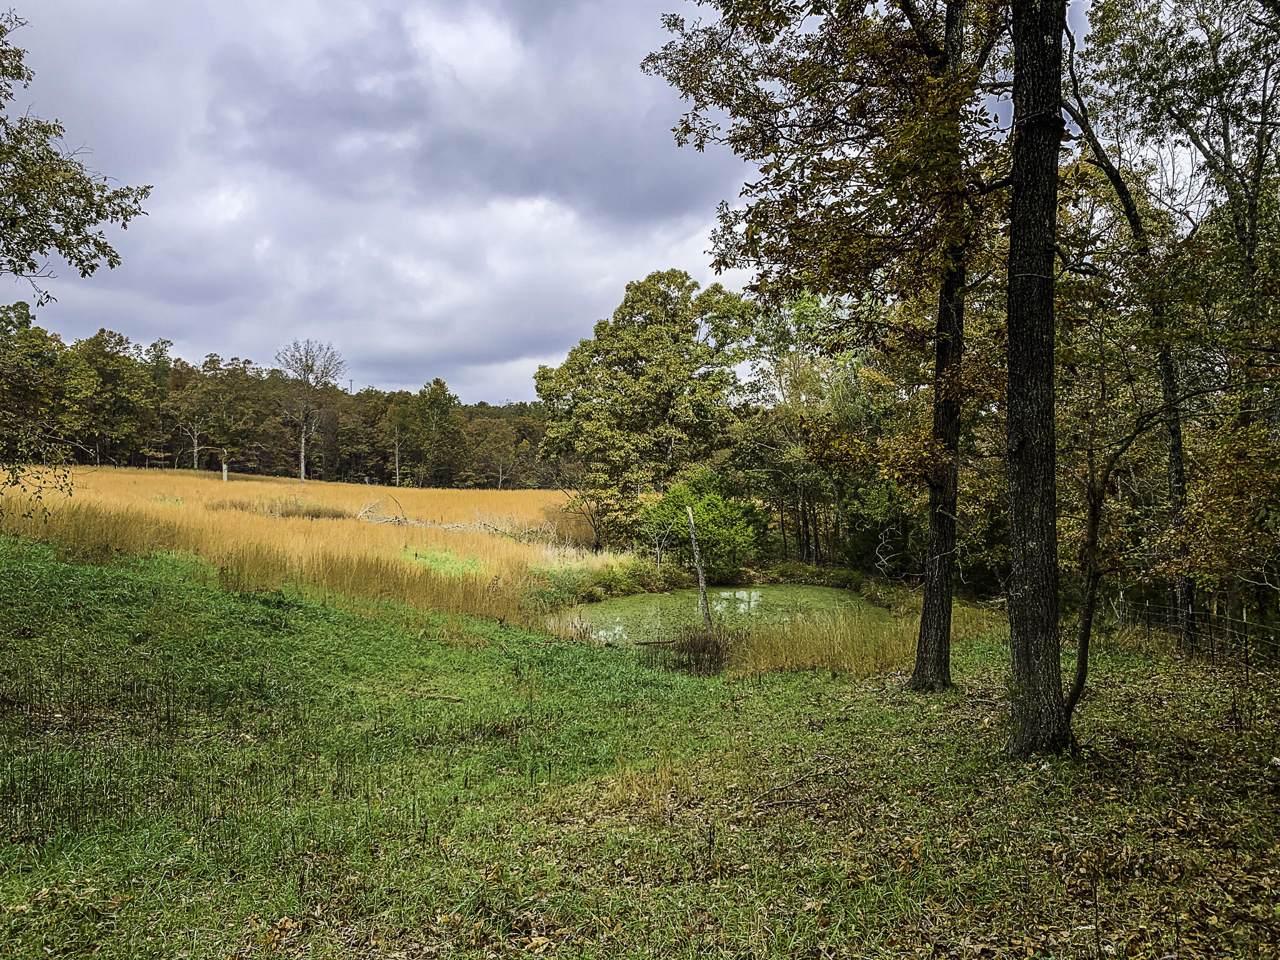 Tbd County Road 530 - Photo 1